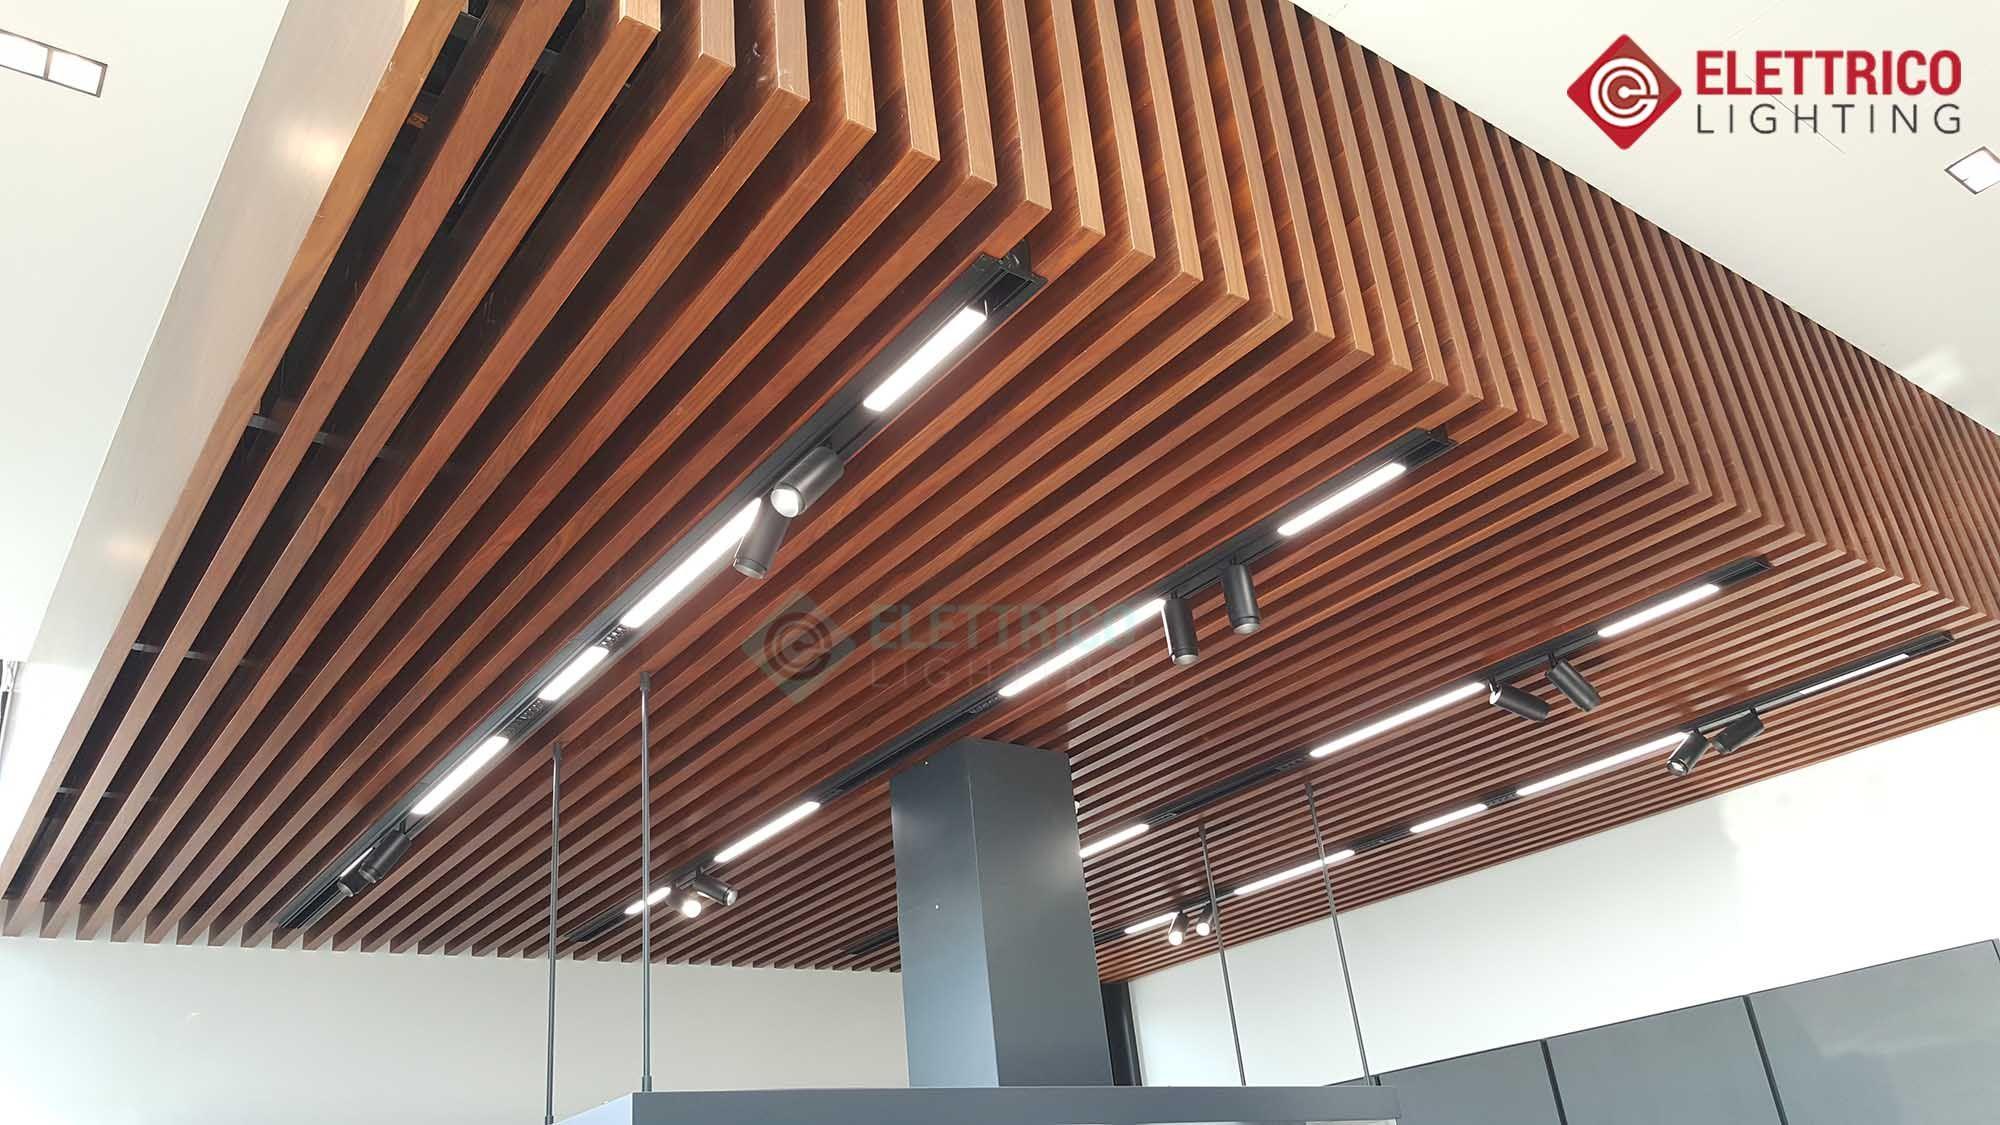 Lighting Track System For Ceiling Elettrico In Dubai Lighting Design Interior Residential Lighting Ceiling Installation